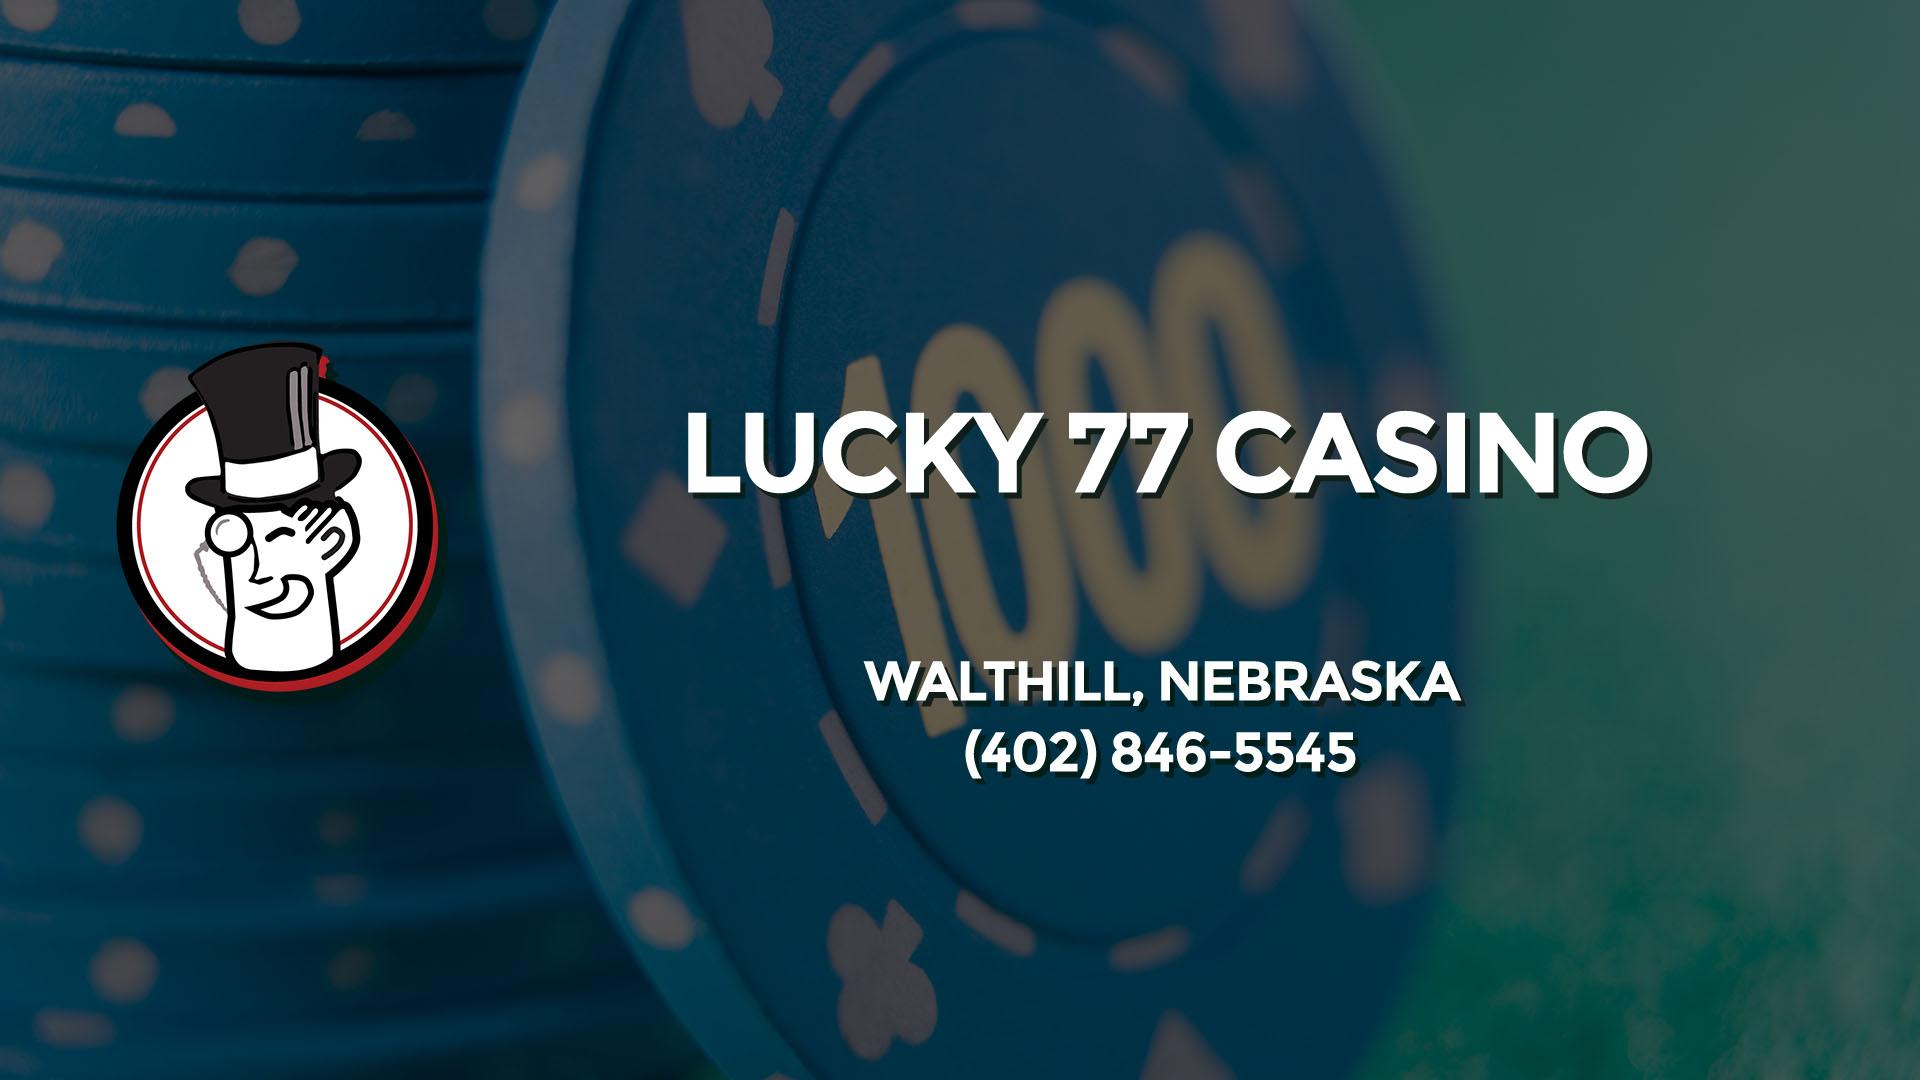 LUCKY 77 CASINO WALTHILL NE